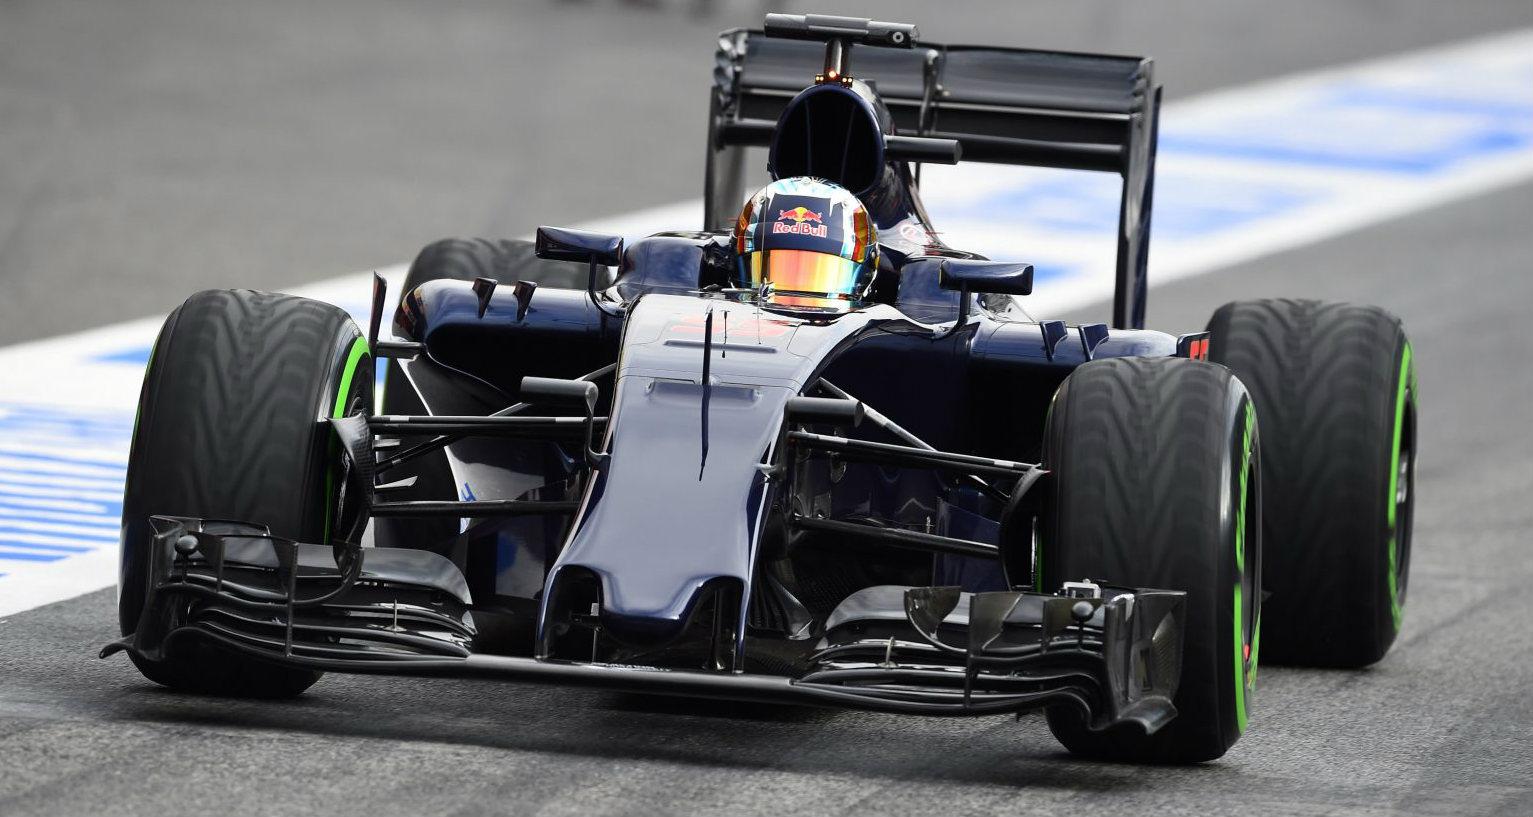 2016_f1_new_cars_toro_rosso_01